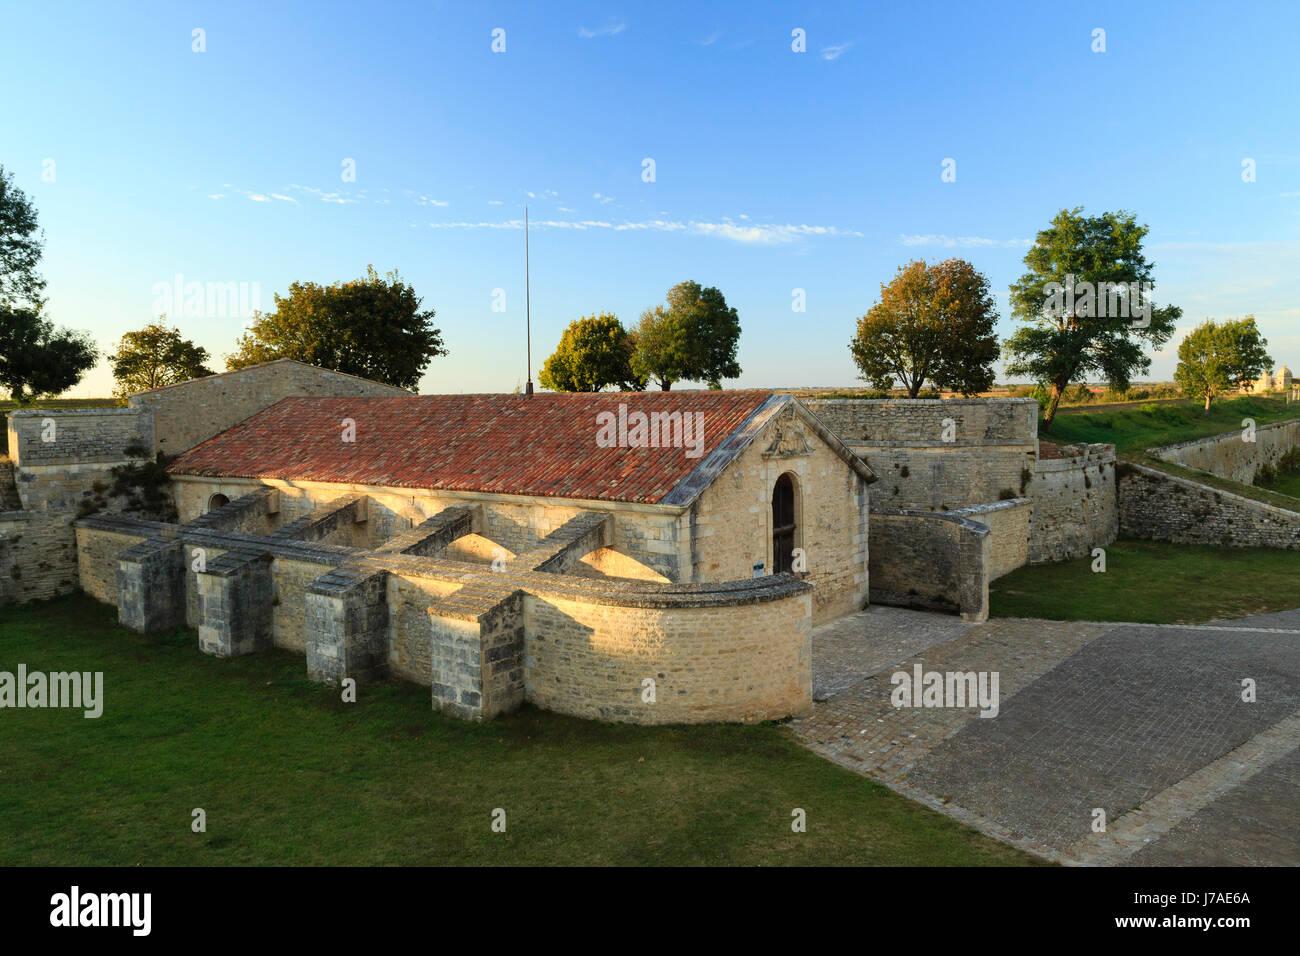 France, Charente Maritime, Hiers Brouage, Citadel of Brouage, gunpowder magazine of Saint Luc Stock Photo